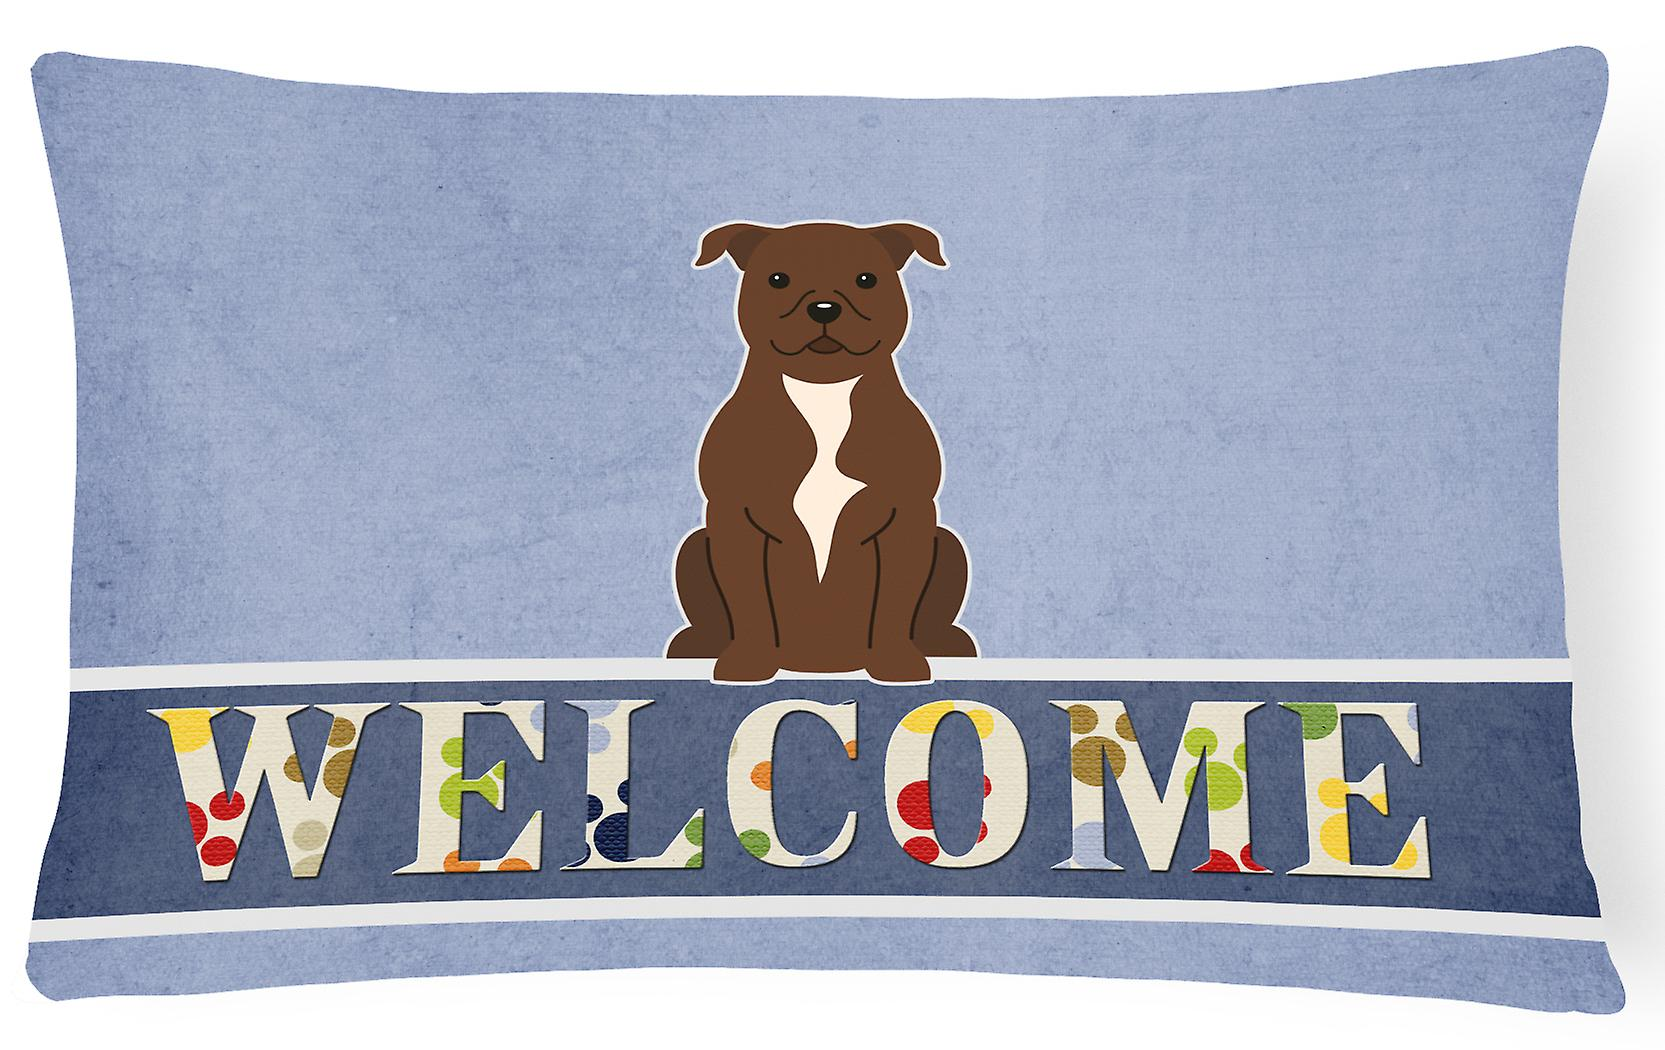 Tissu Au Staffordshire Oreiller Bull Décoratif Terrier Toile Bienvenue Chocolat LjqzMVpGSU